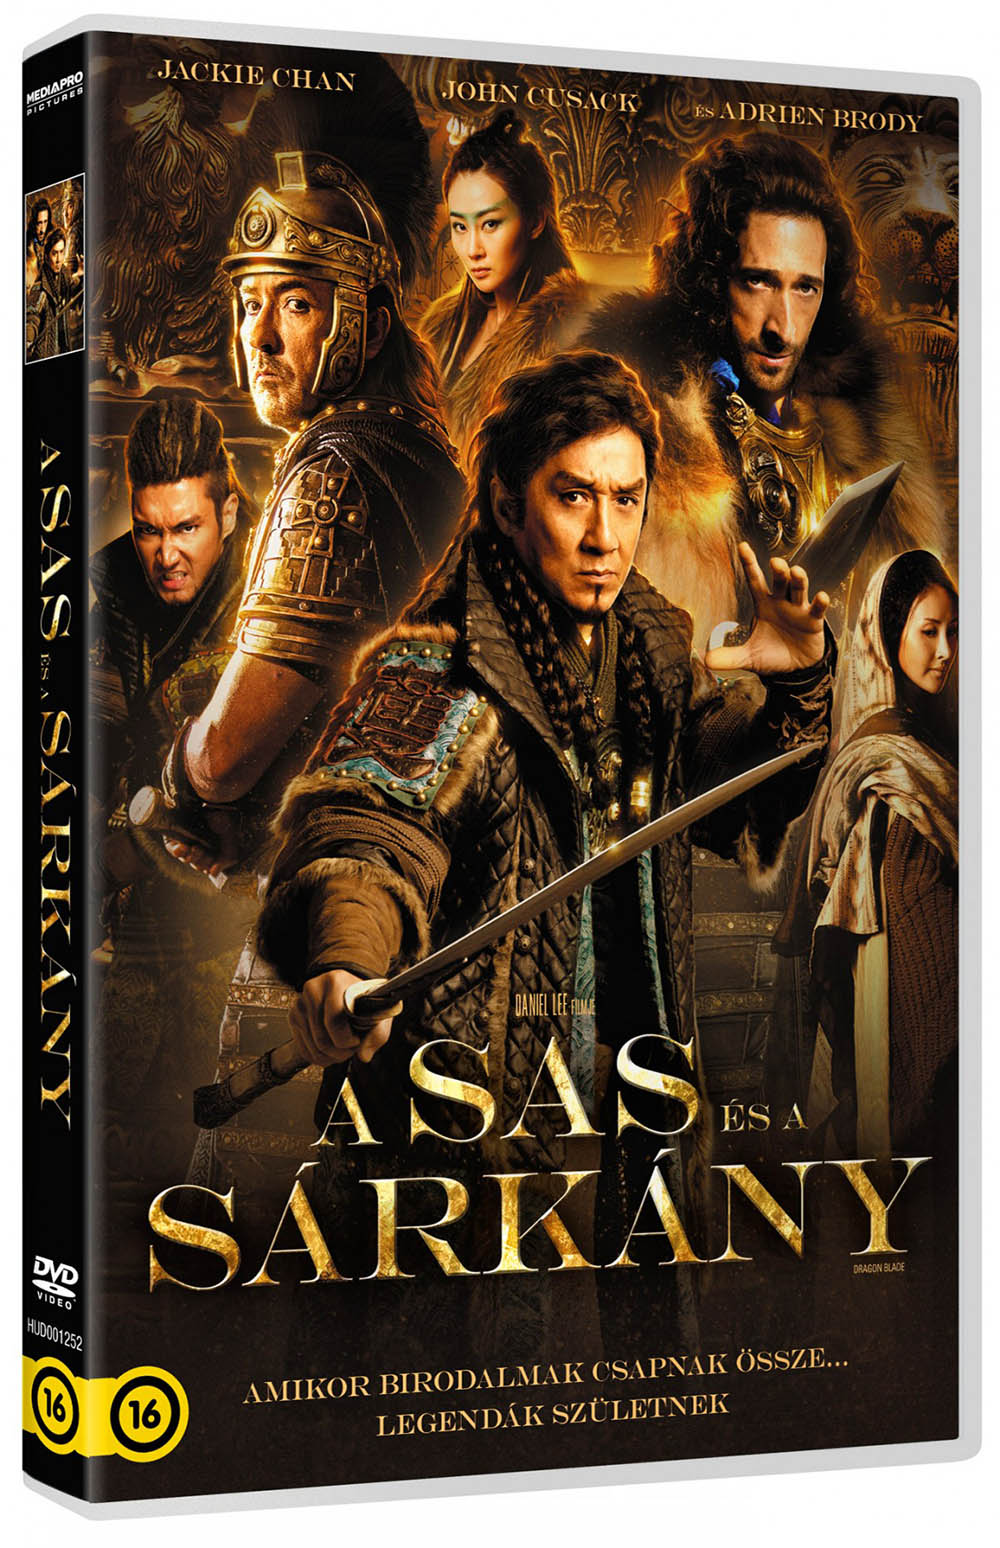 a-sas-es-a-sarkany-dvd.jpg